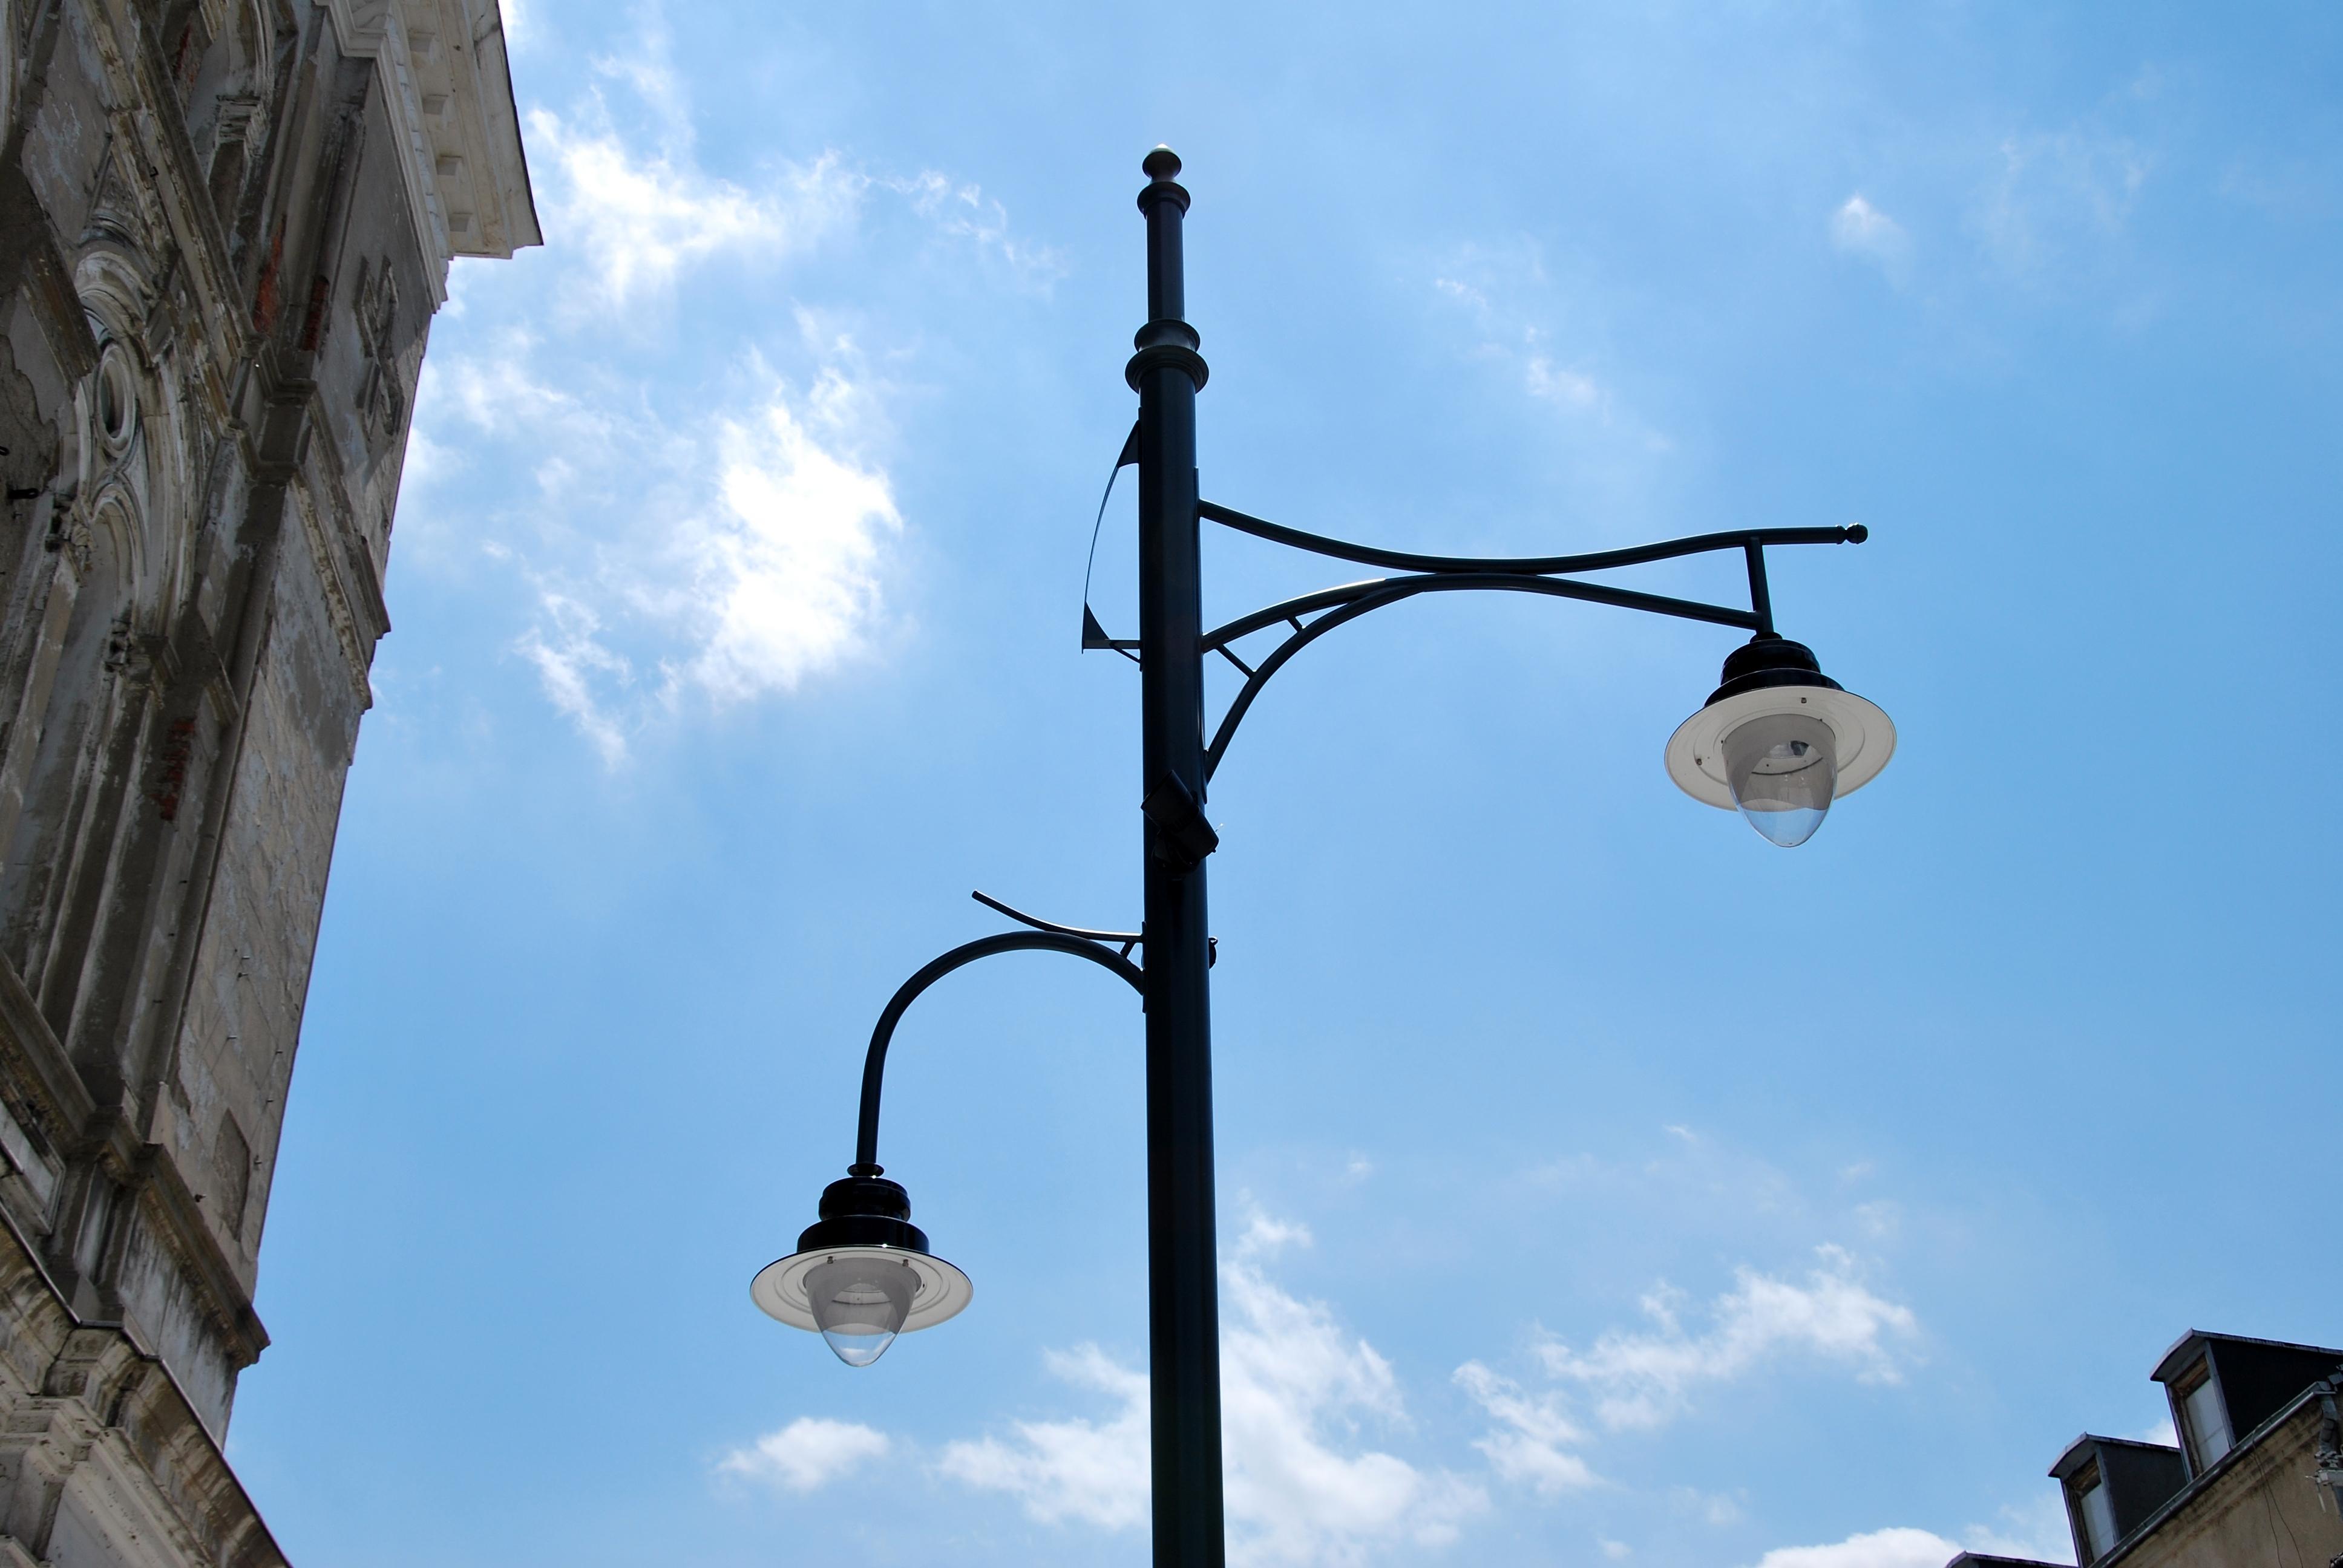 after 2013 renovation, a lamp.jpg Polski: Ulica Piotrkowska po renowacji 2013 - lampa English: Piotrkowska Street after 2013 renovation, a lamp Date